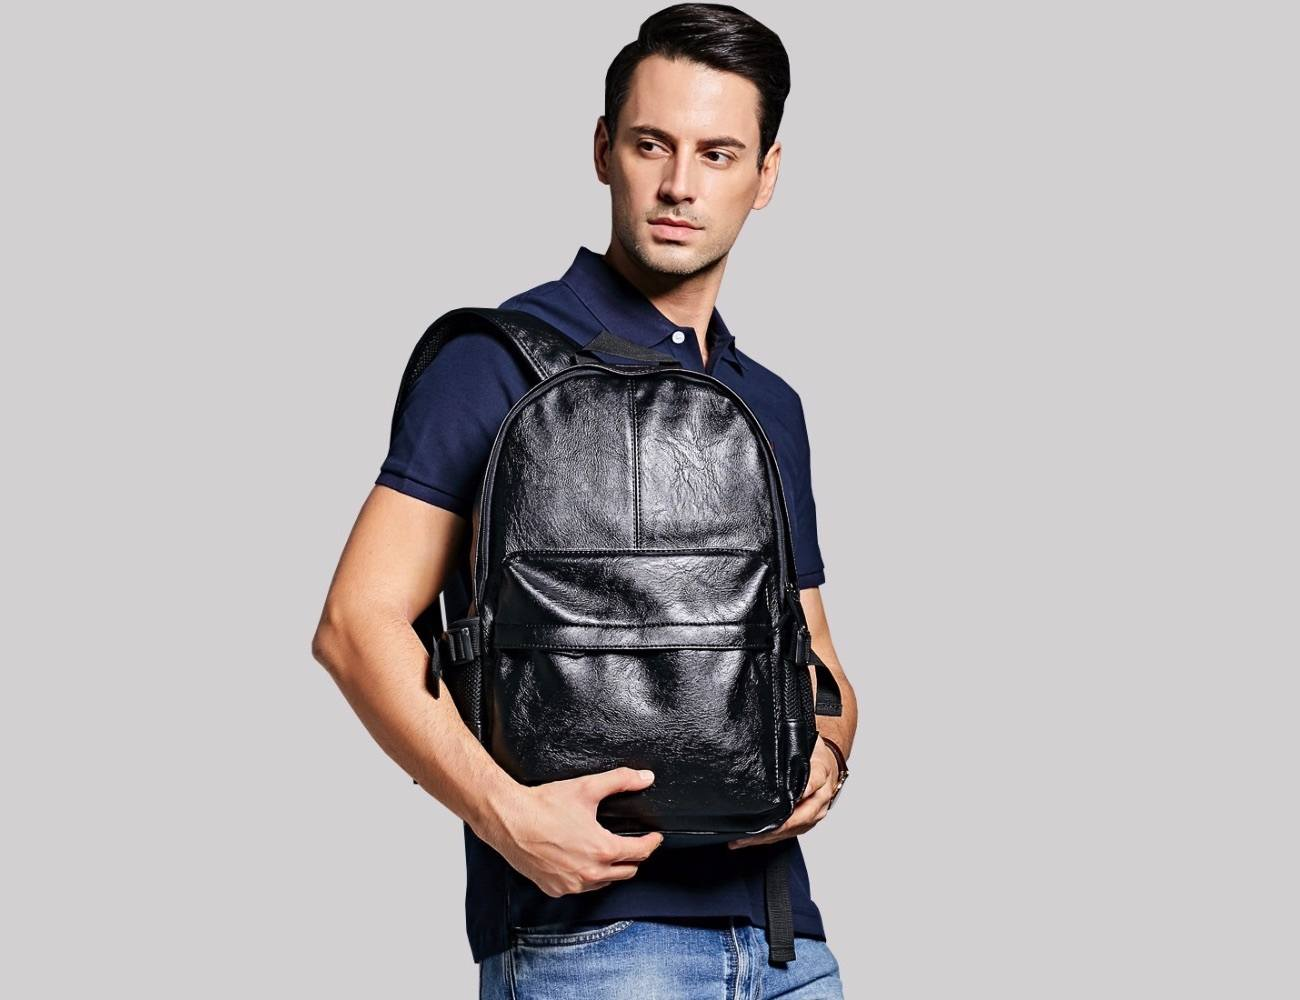 Large Sized Everyday Leather Backpack